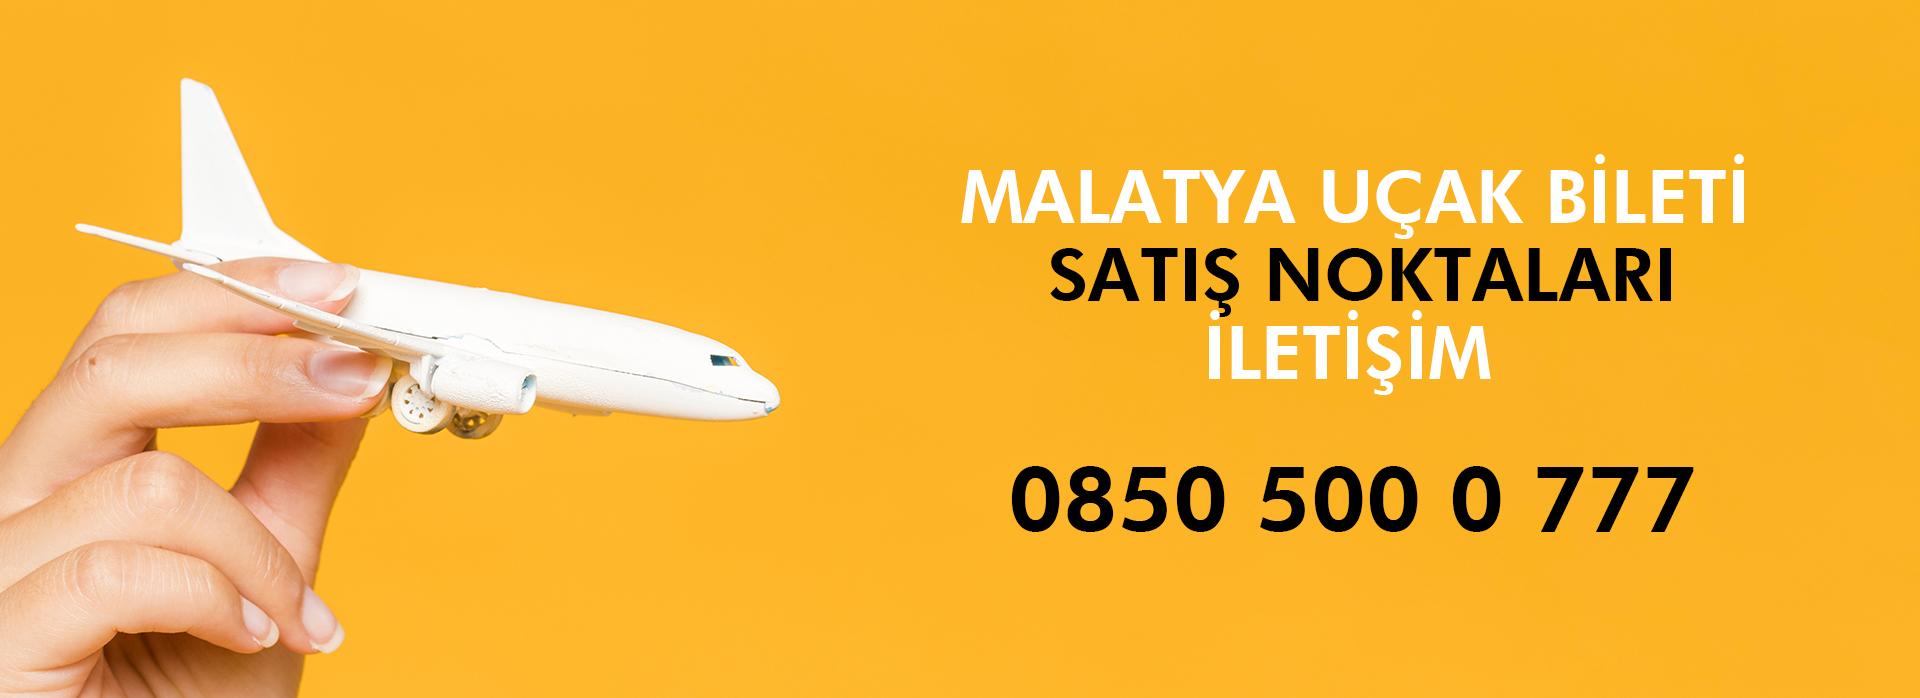 malatya uçak bileti iletişim